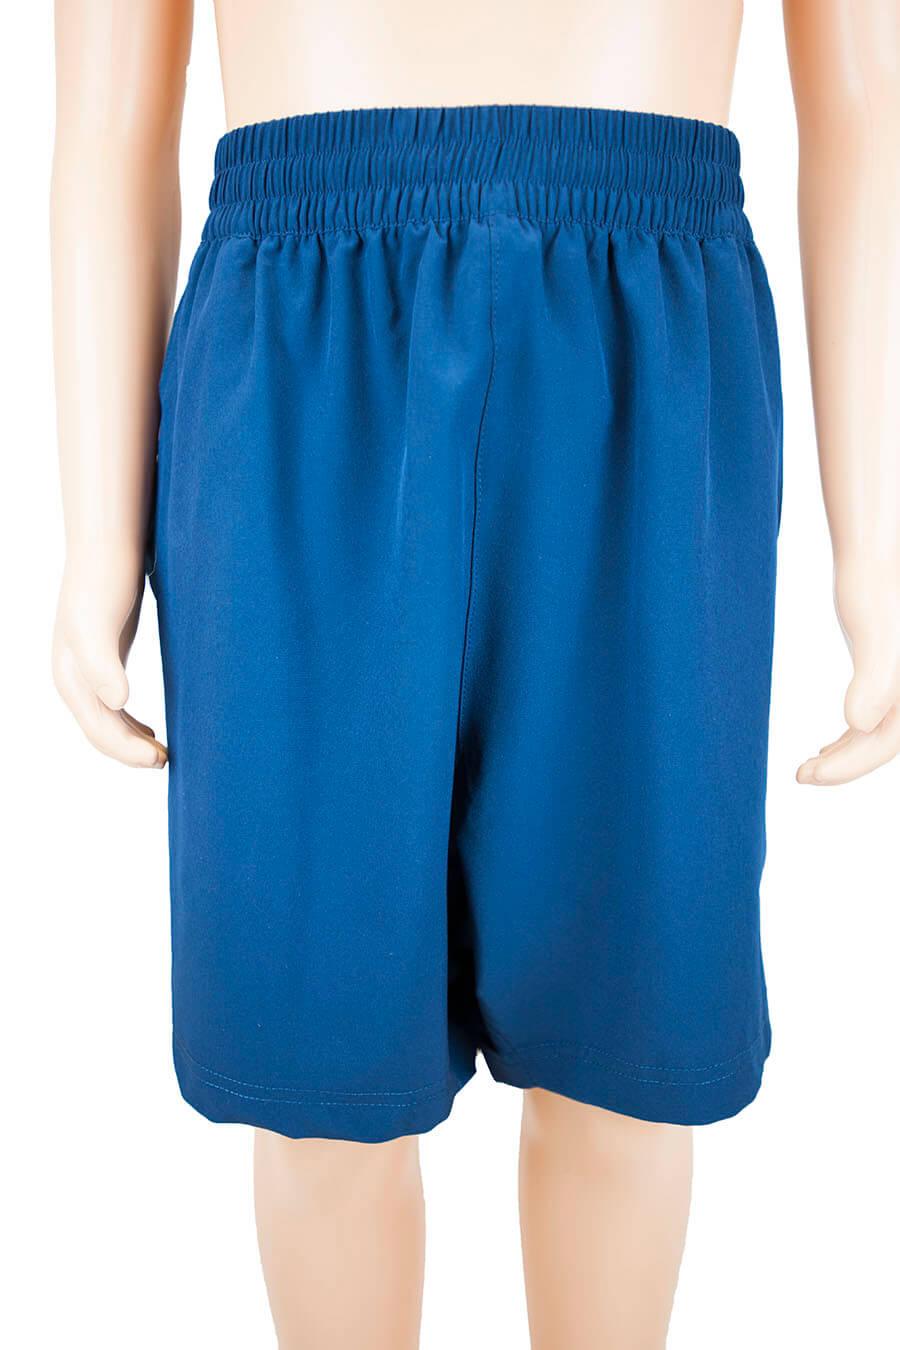 Tockington Manor School Pro training shorts